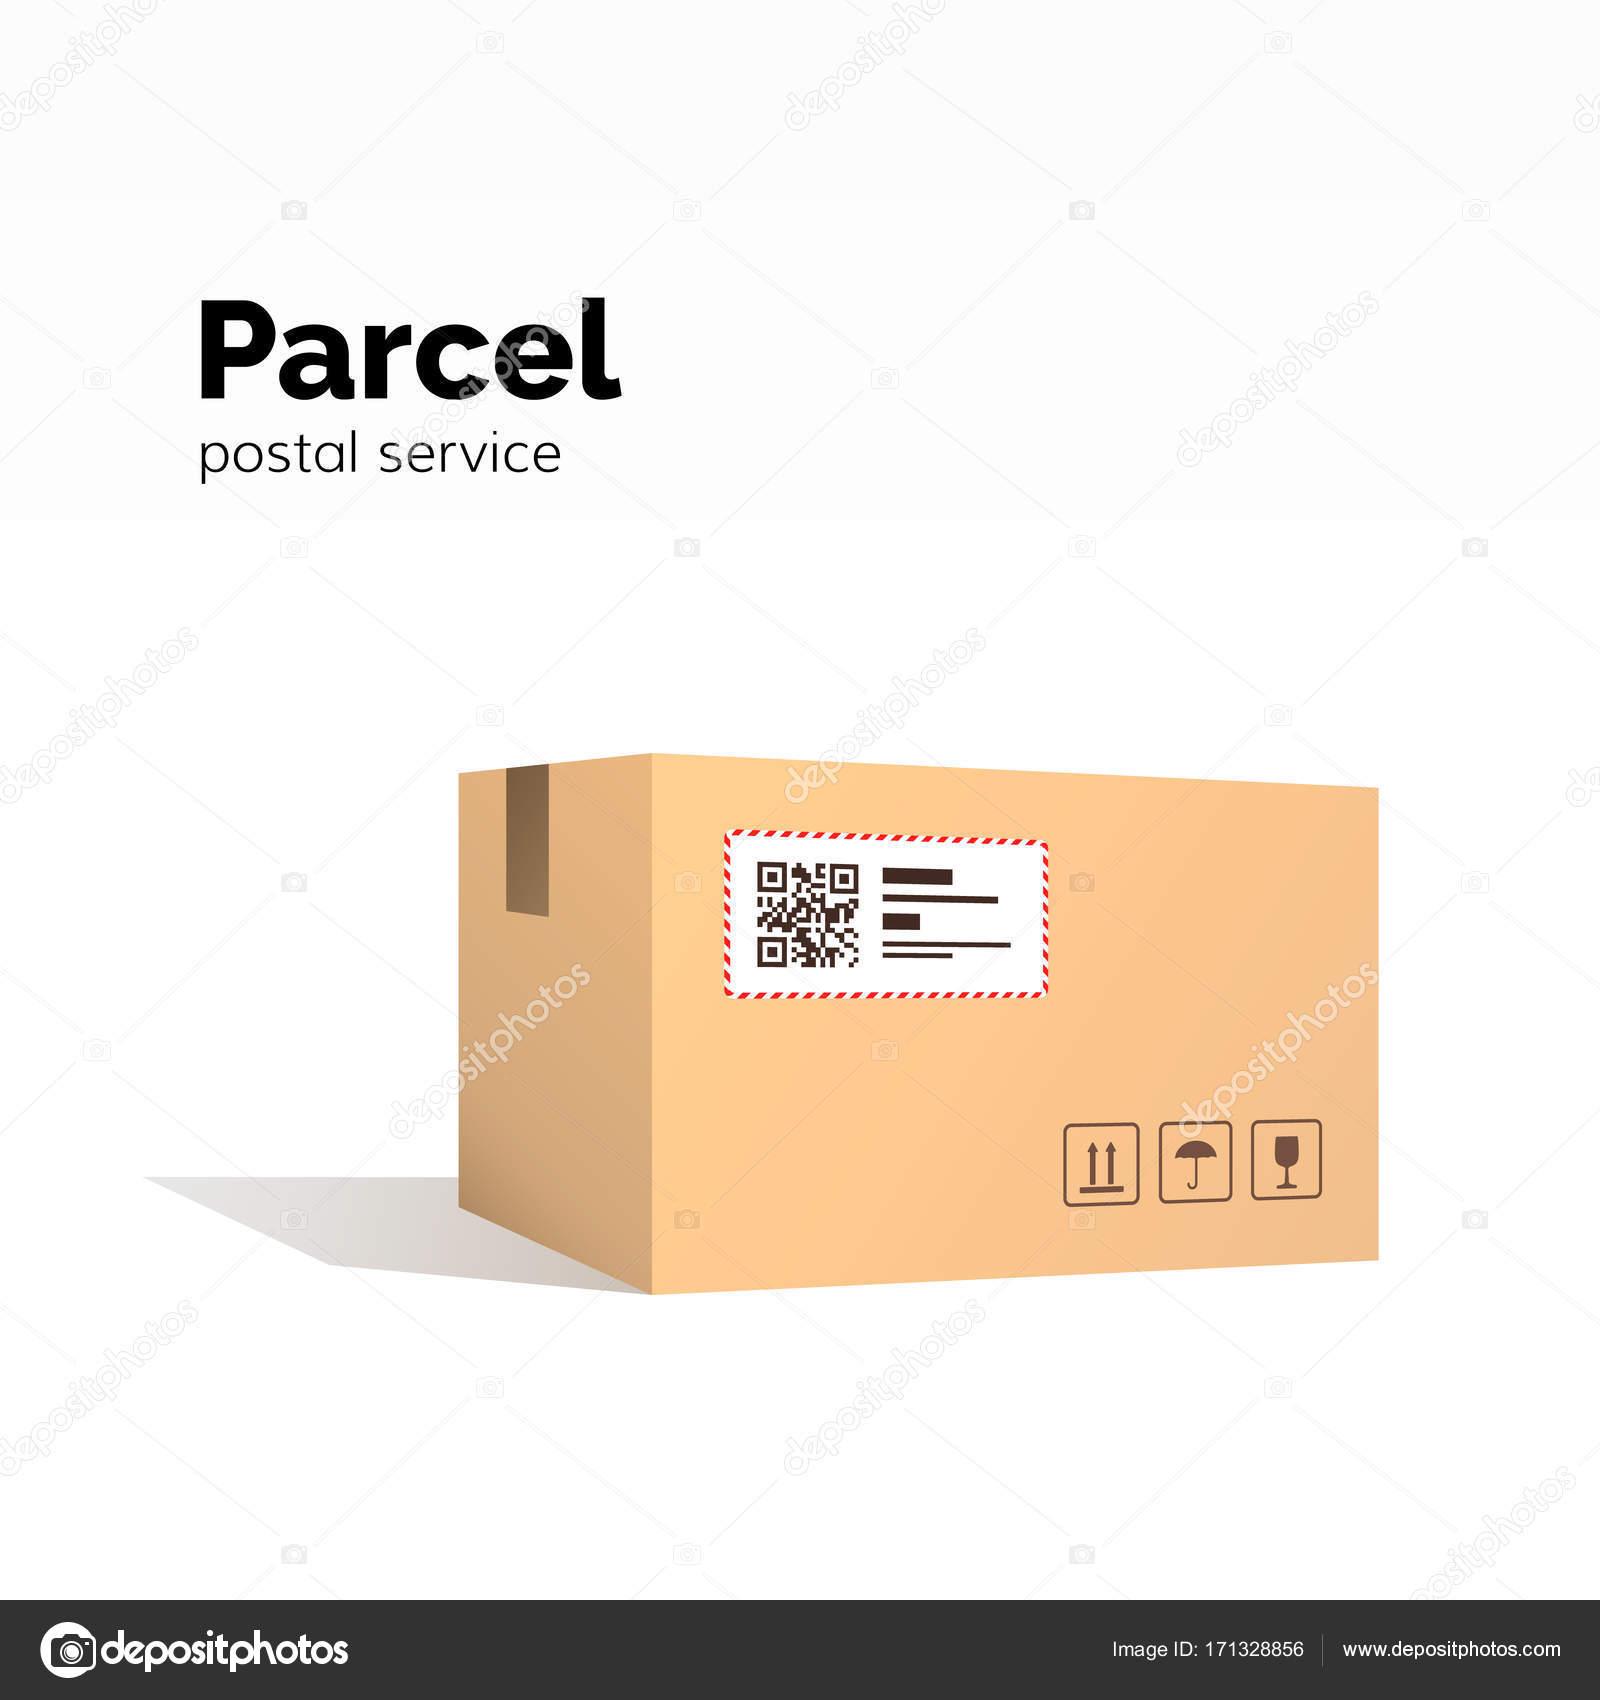 Ulaşım Parsel Karton Kutu Kapsayıcı Qr Kod Kapalı Parsel Kutusu